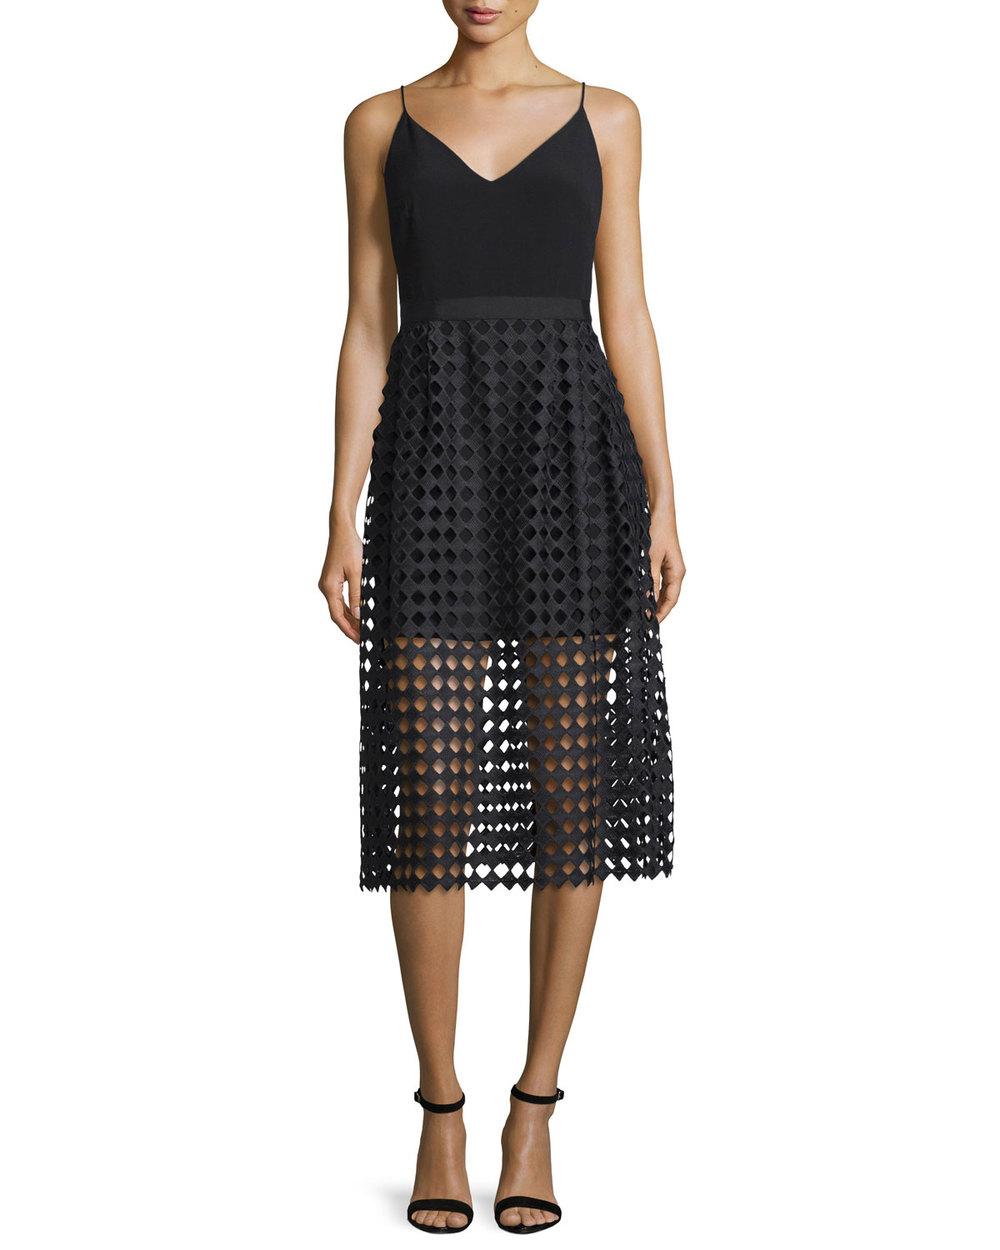 Cynthia Rowley Sleeveless Mesh-Overlay Midi Dress, Black • $190.40 • Neiman Marcus